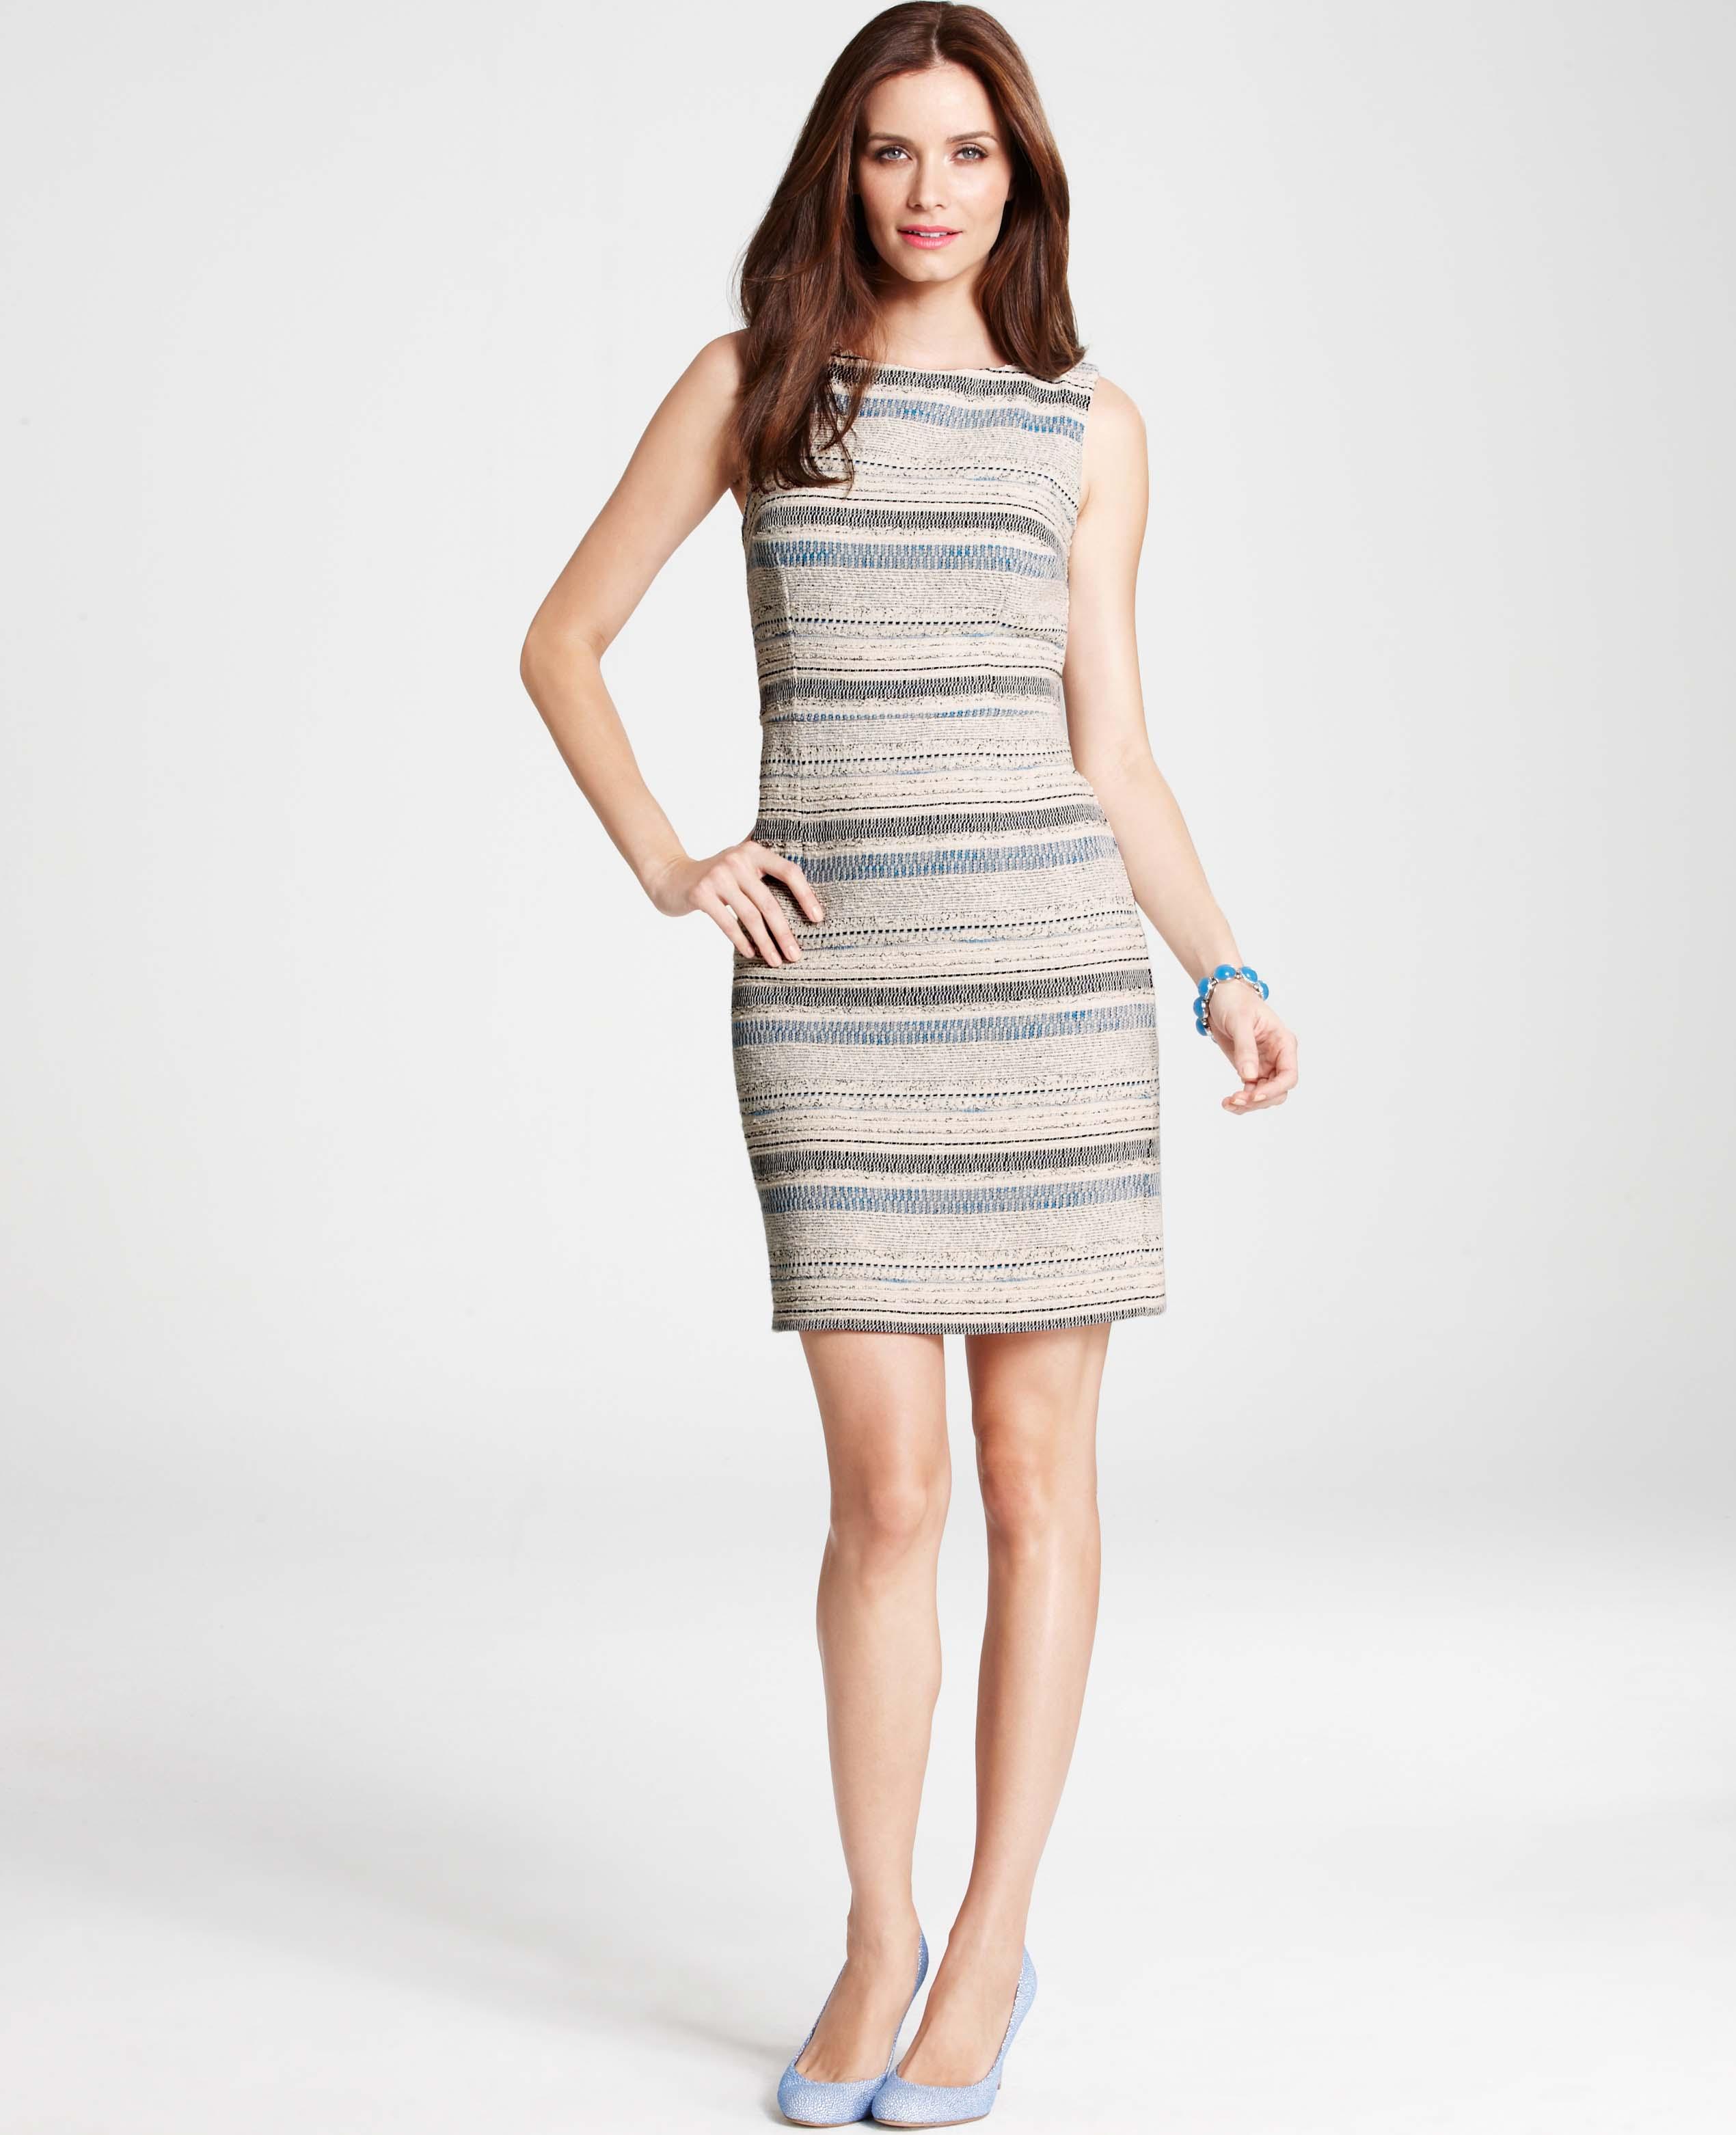 Lyst - Ann Taylor Textured Stripe Tweed Sheath Dress in Gray